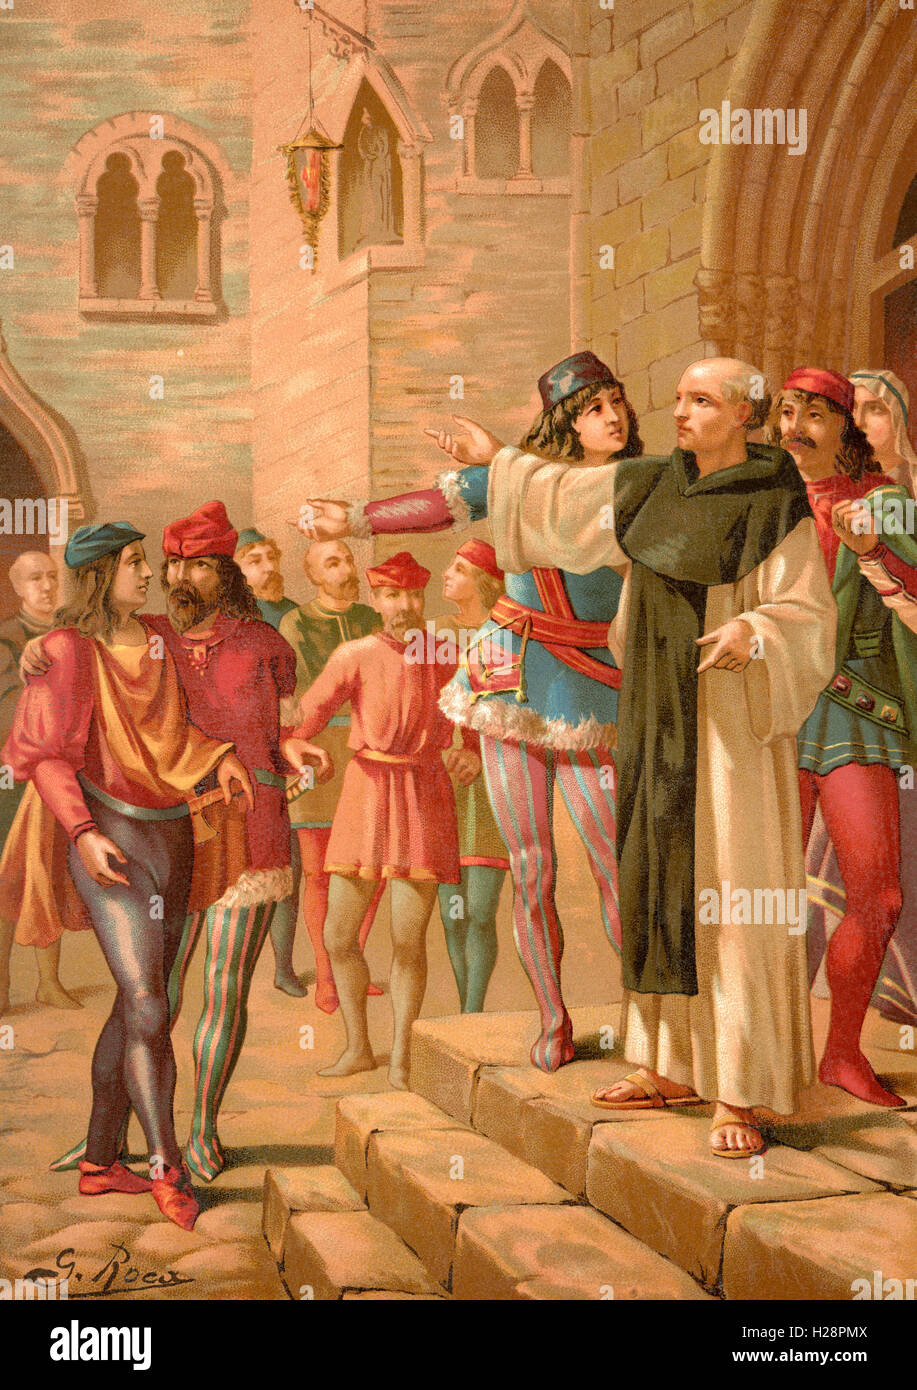 La predicación de Savonarola en Florencia, Italia. Girolamo Savonarola, 1452 - 1498. Fraile dominico italiano Imagen De Stock